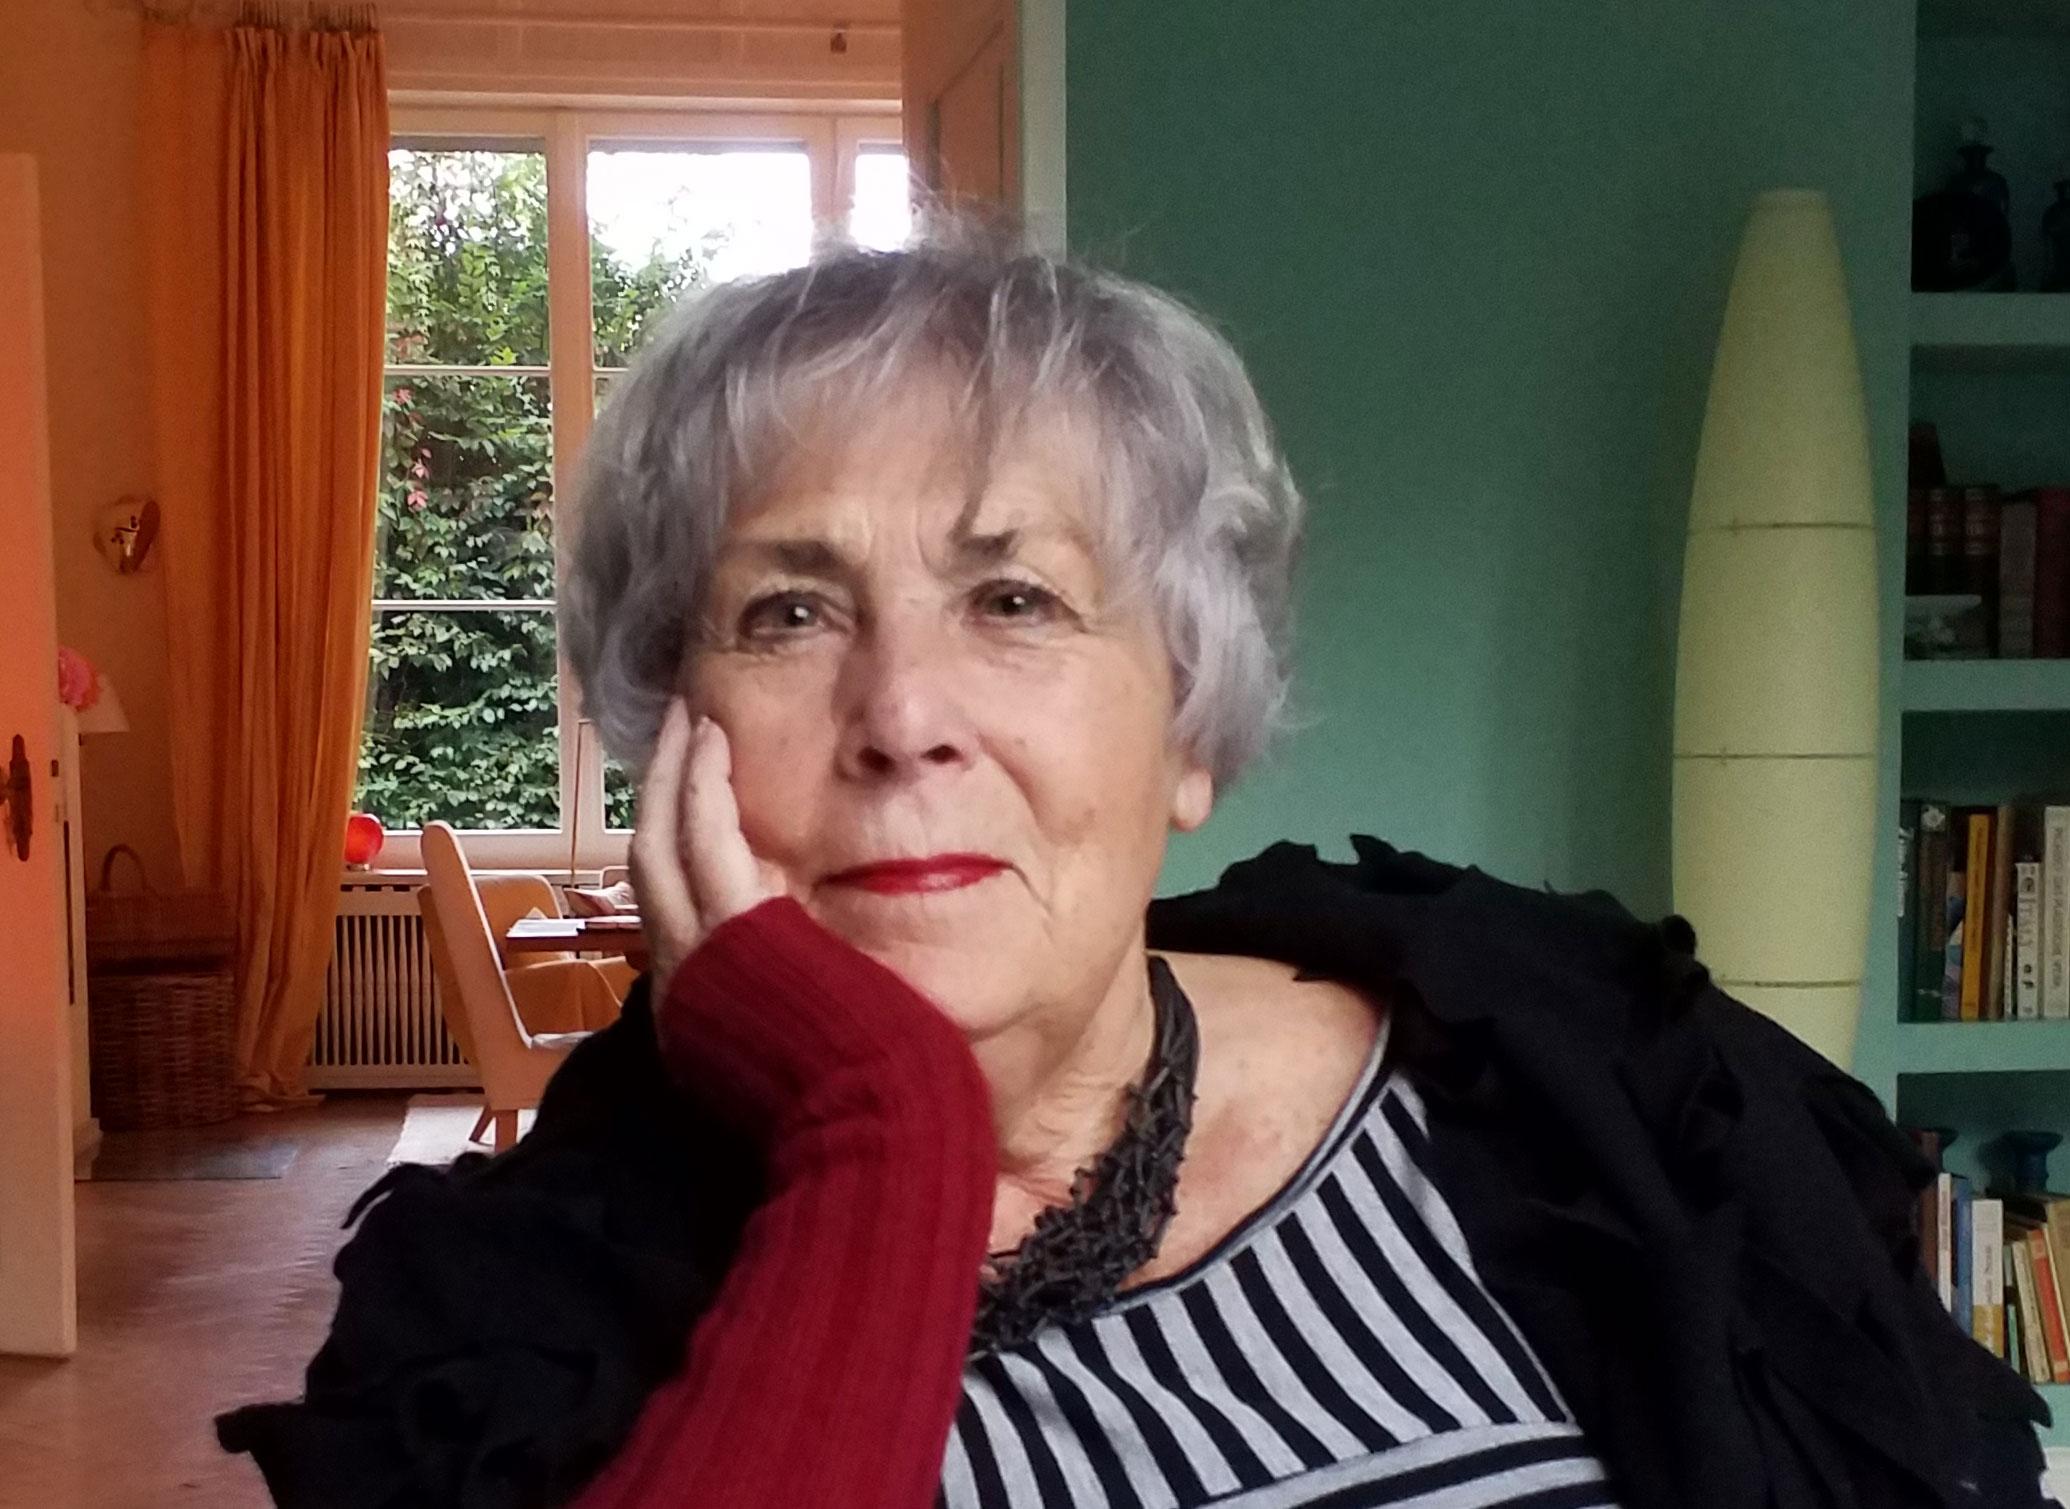 Marie-Thérèse Schins